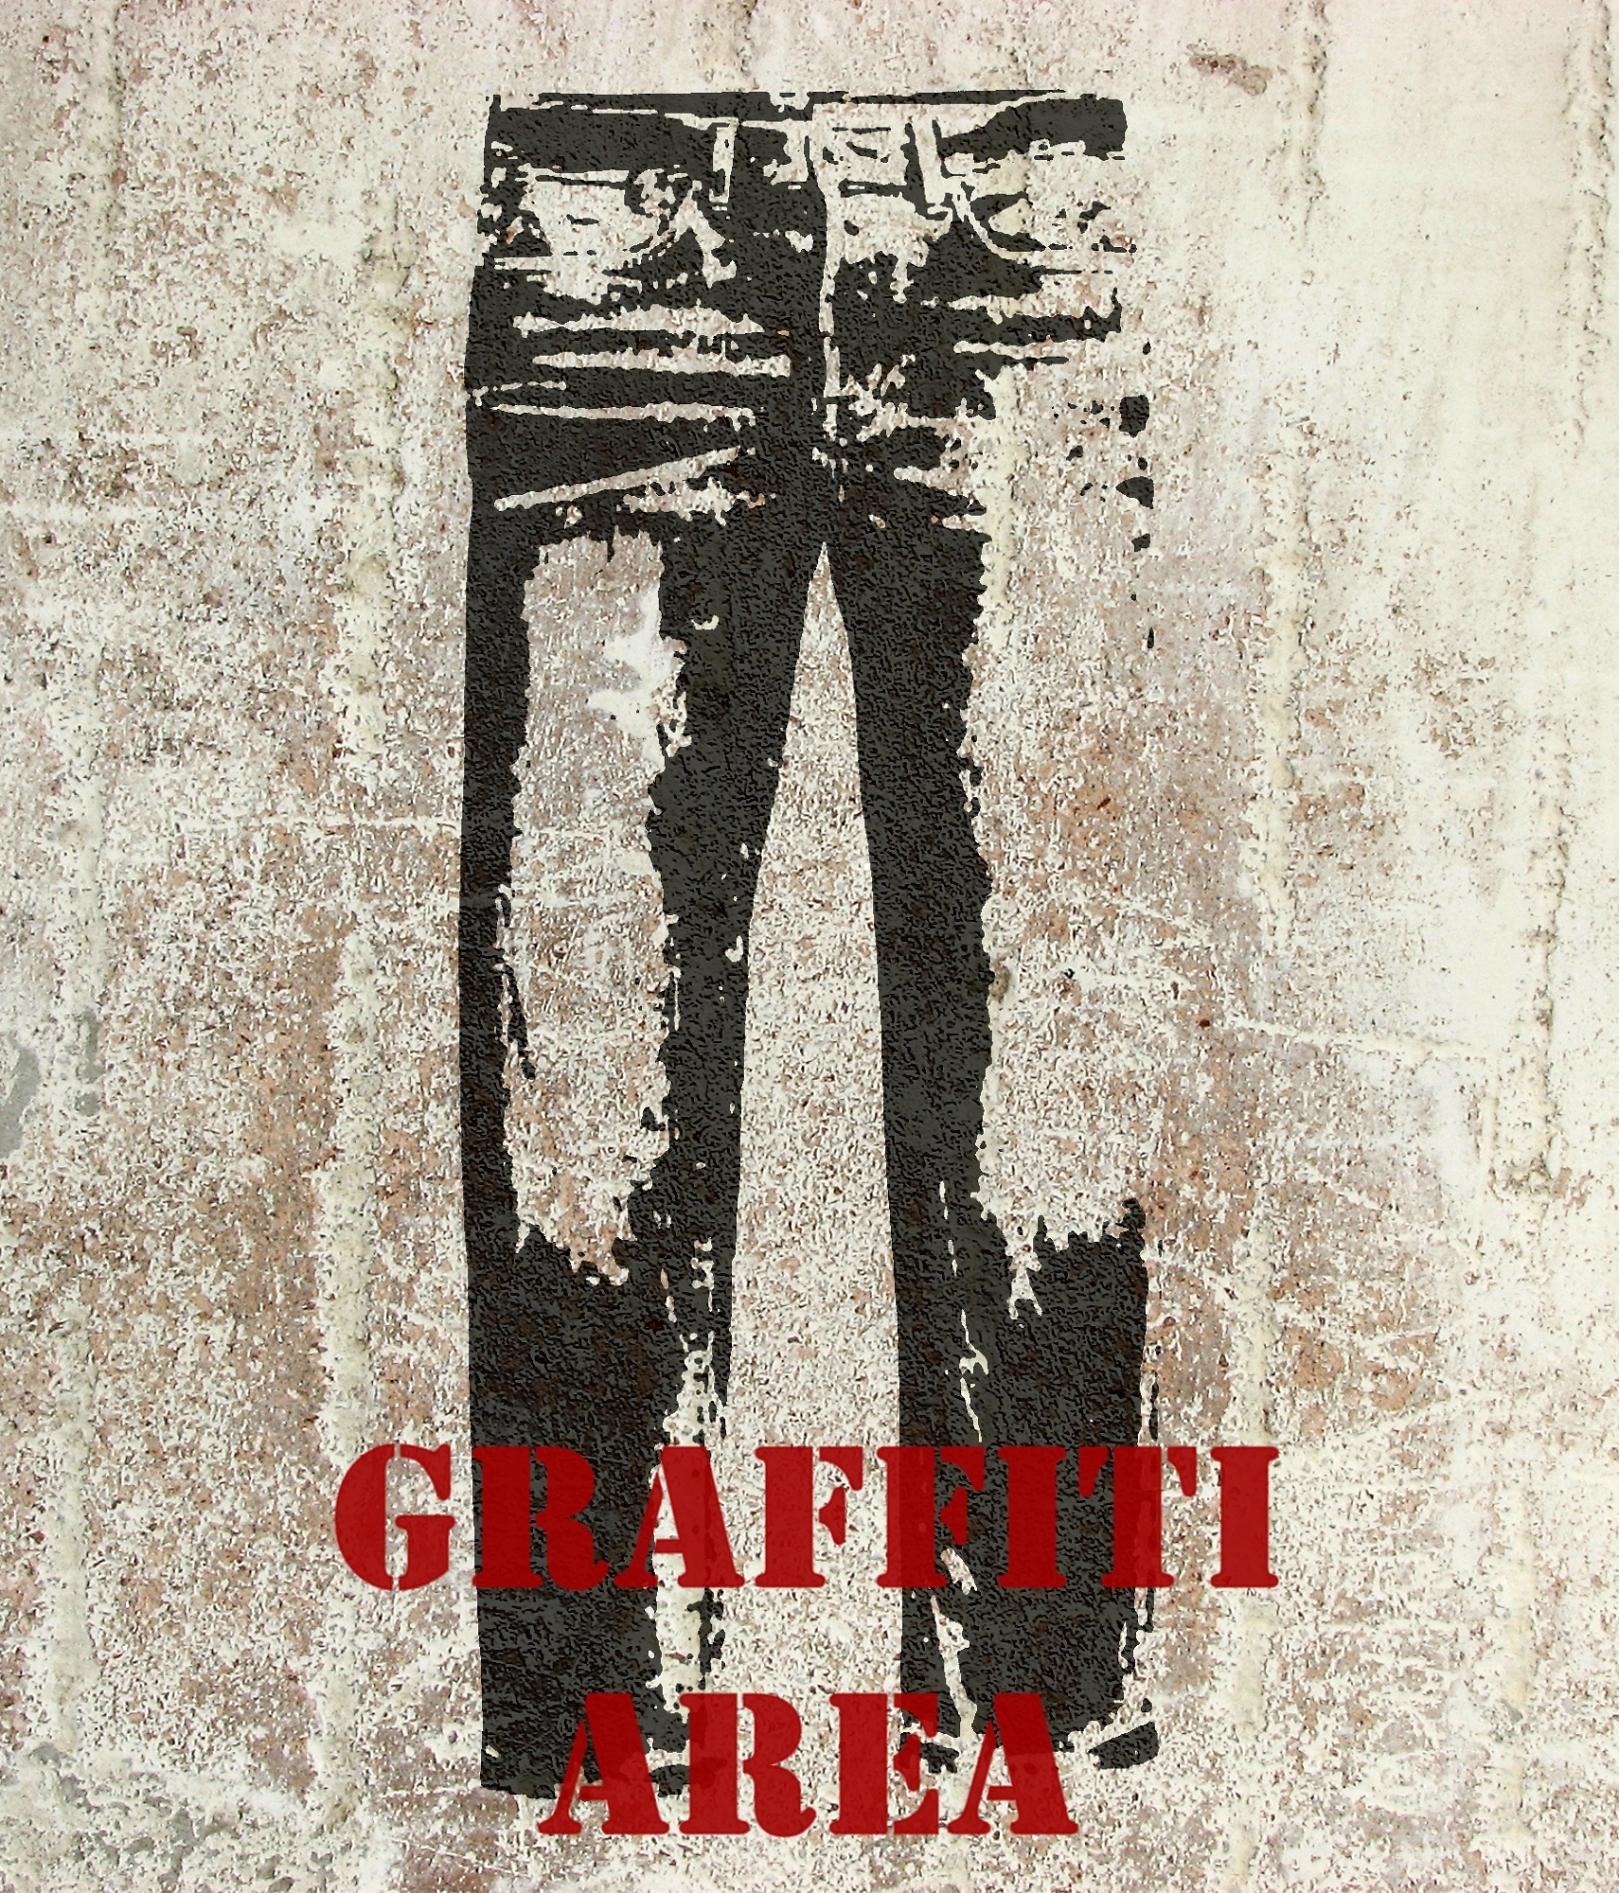 modellierte Betonobjekte: Jeans in Beton